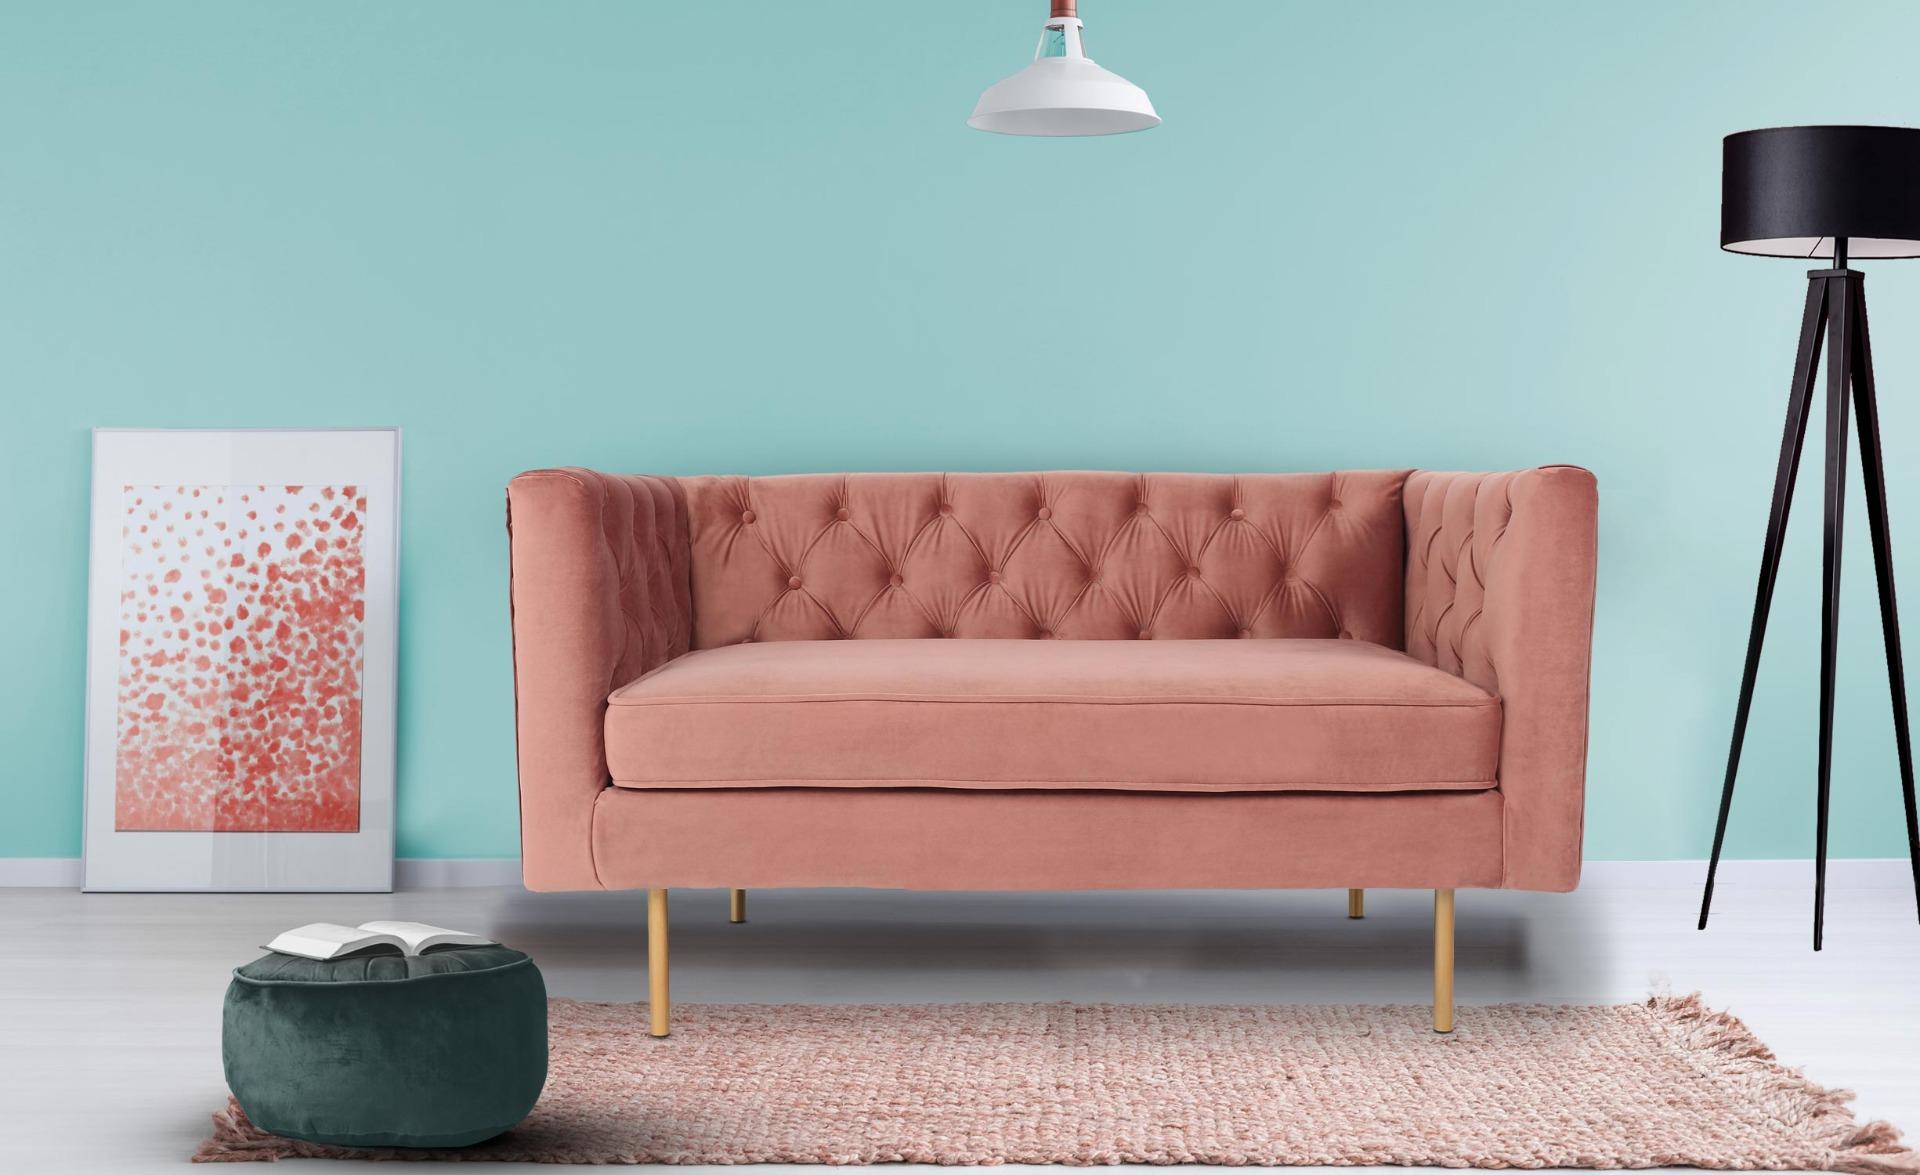 Sacha 2-Sitzer Sofa mit Samtbezug Rosa